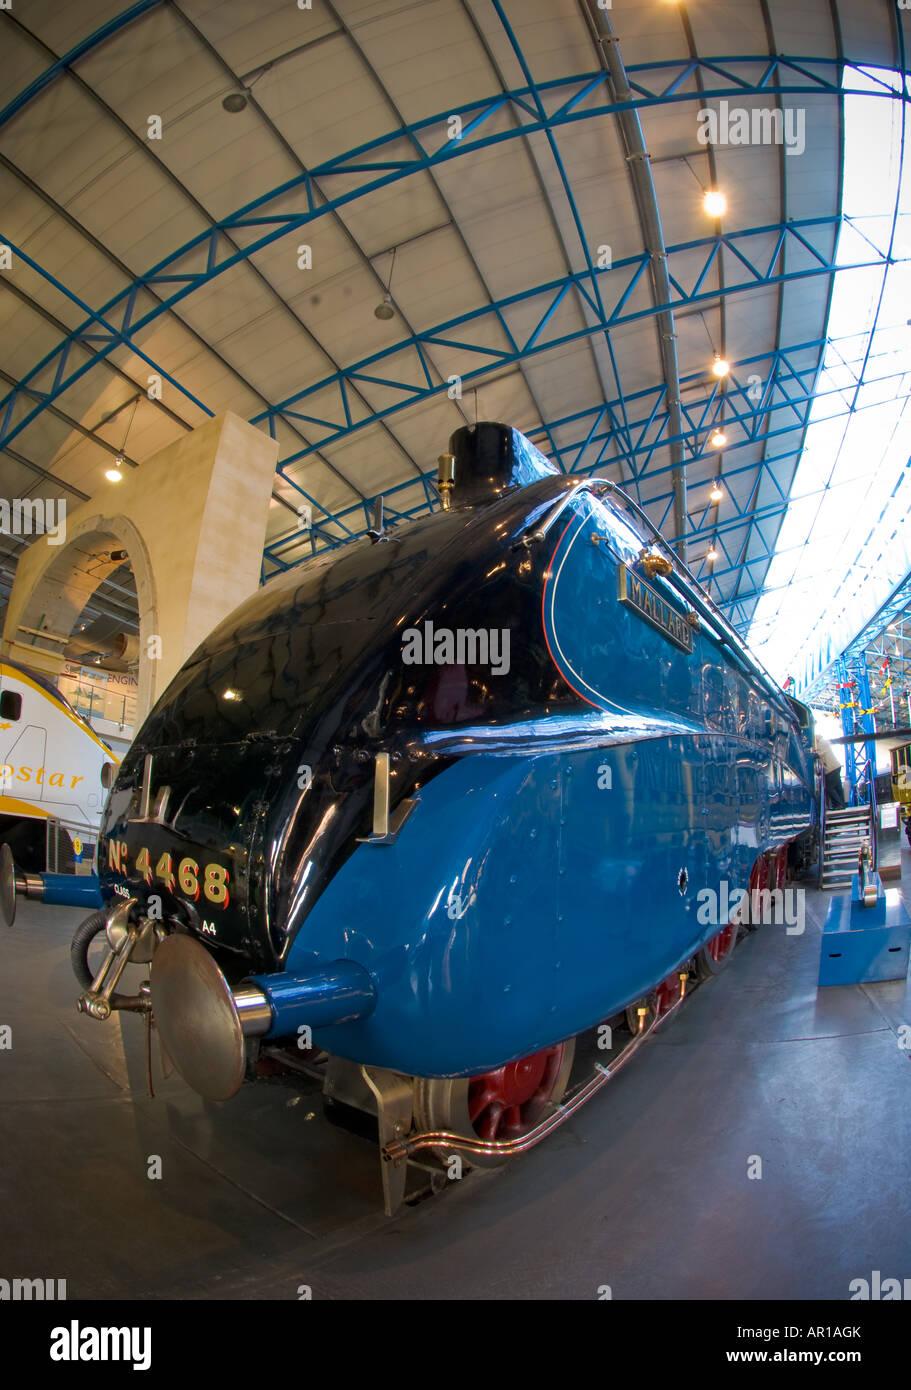 The Mallard train at the National Railway Museum NRM York - Stock Image